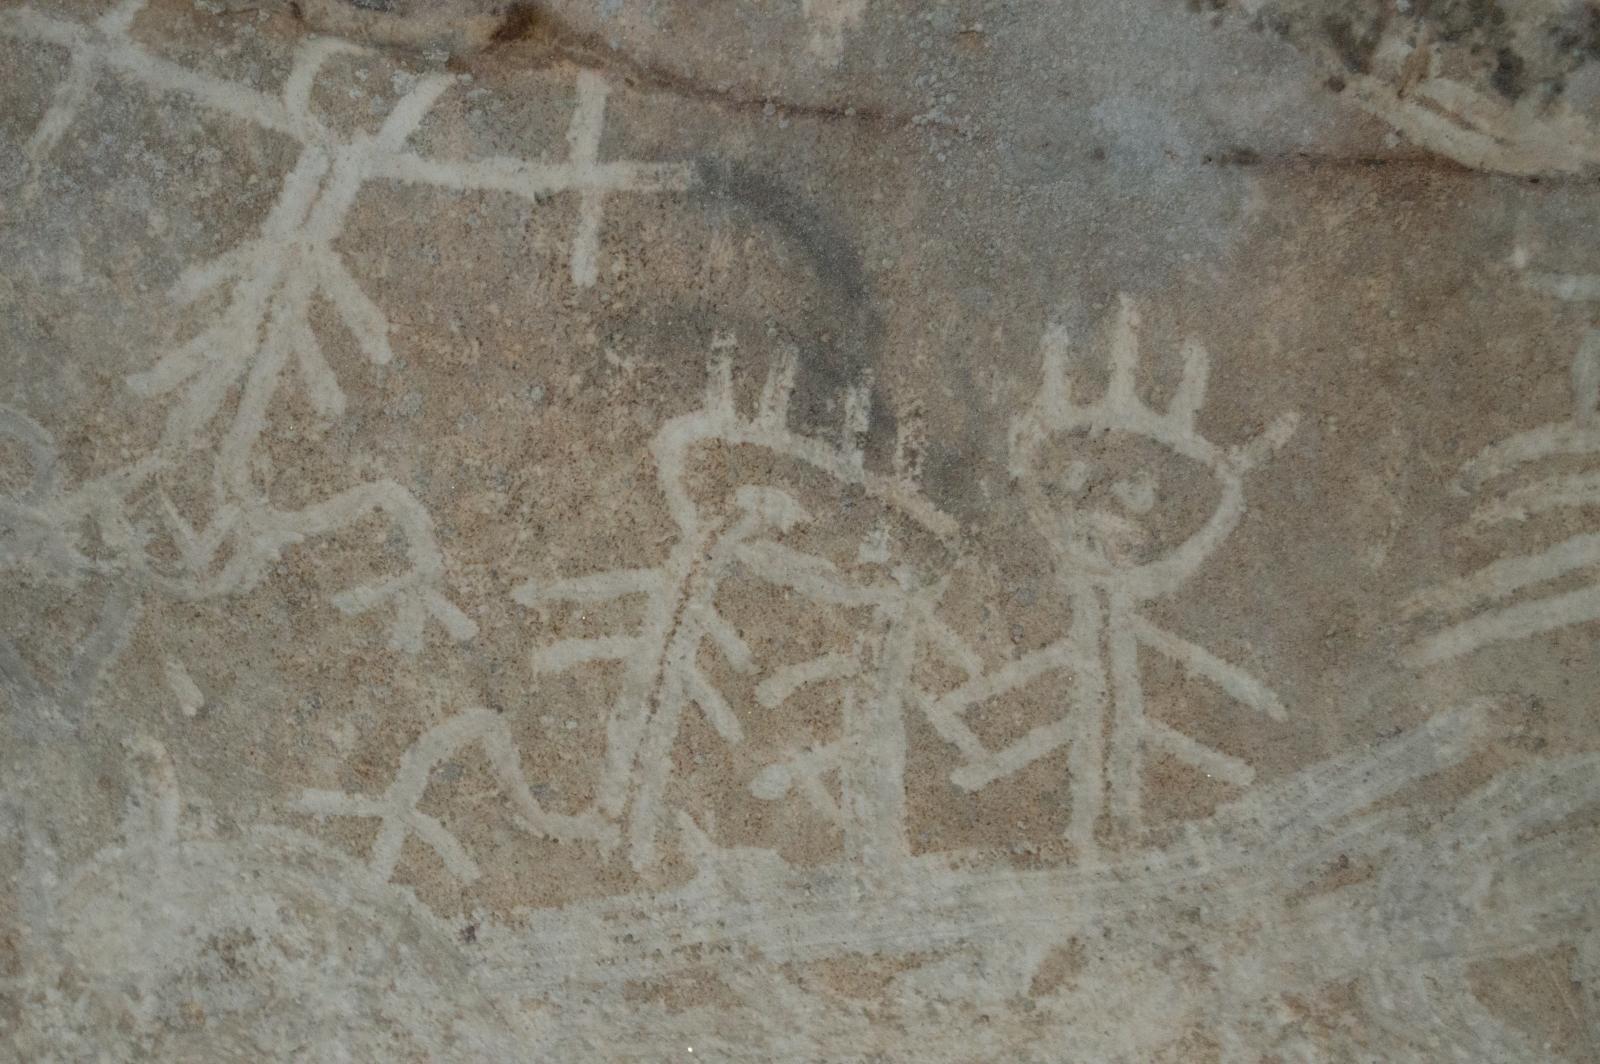 cave art Americas